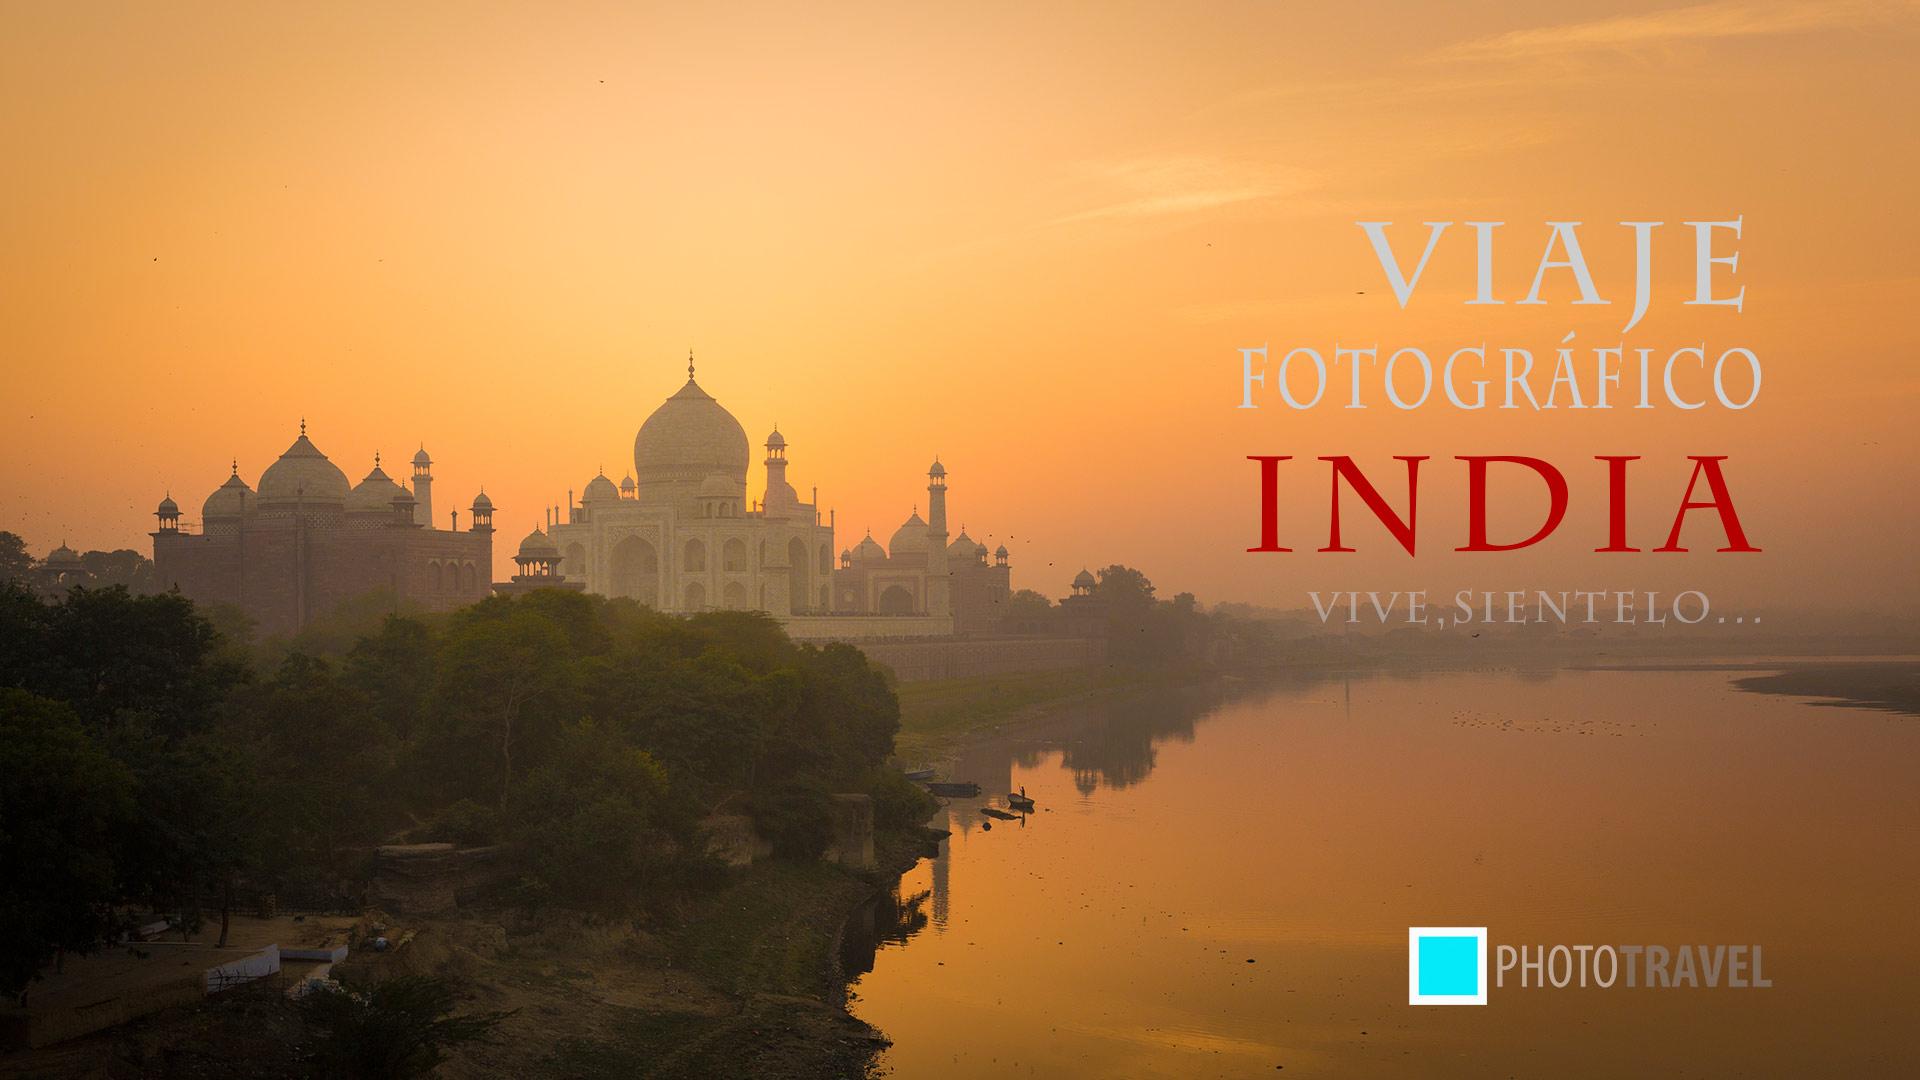 viaje-fotografico-india-2019